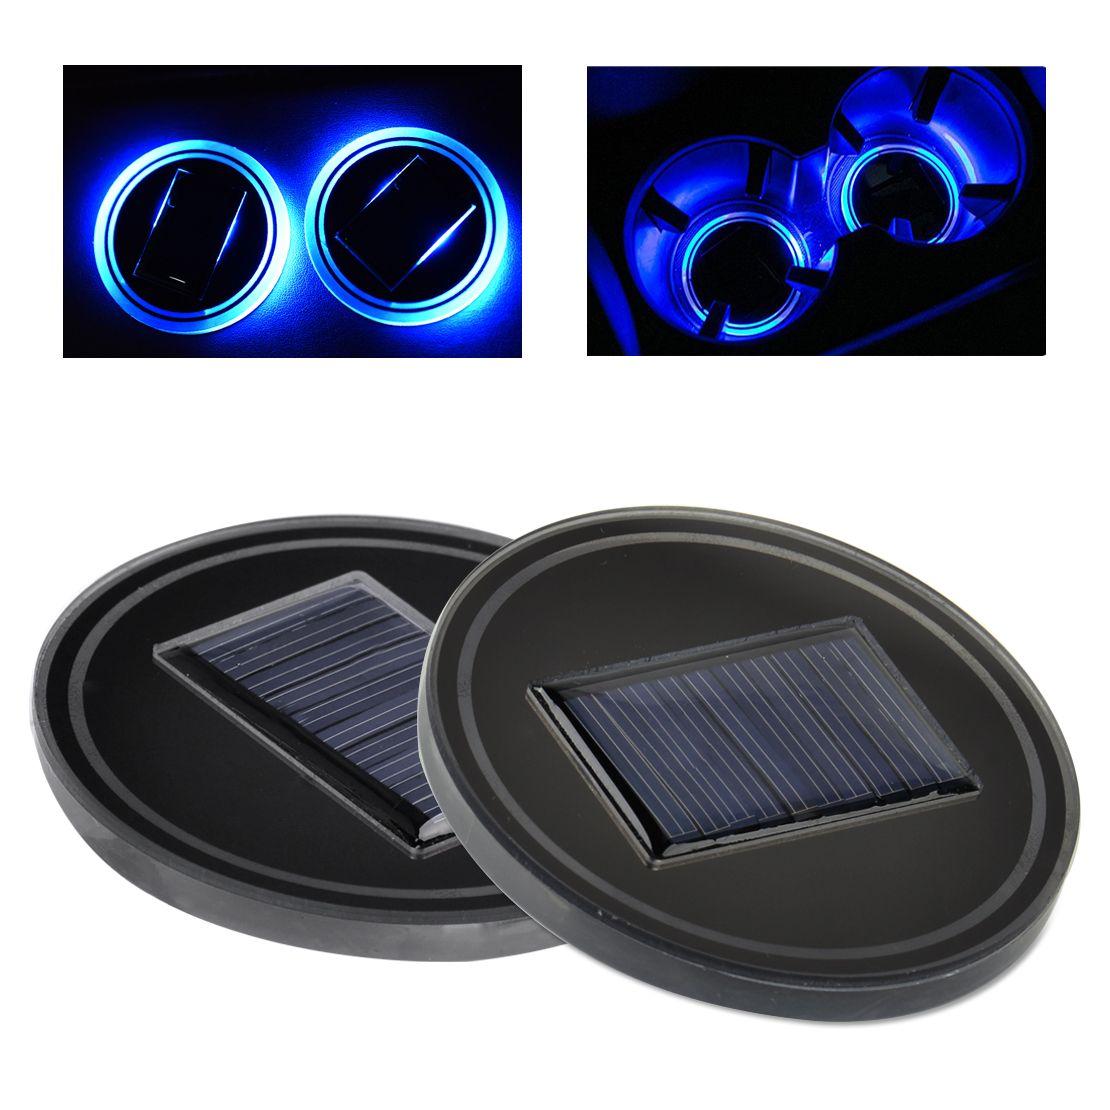 CITALL 2pcs Car Solar Energy Blue LED Light Cover Trim Atmosphere Lamp Decor Mat Cup Holder Bottom Pad for Ford VW Benz Audi BMW